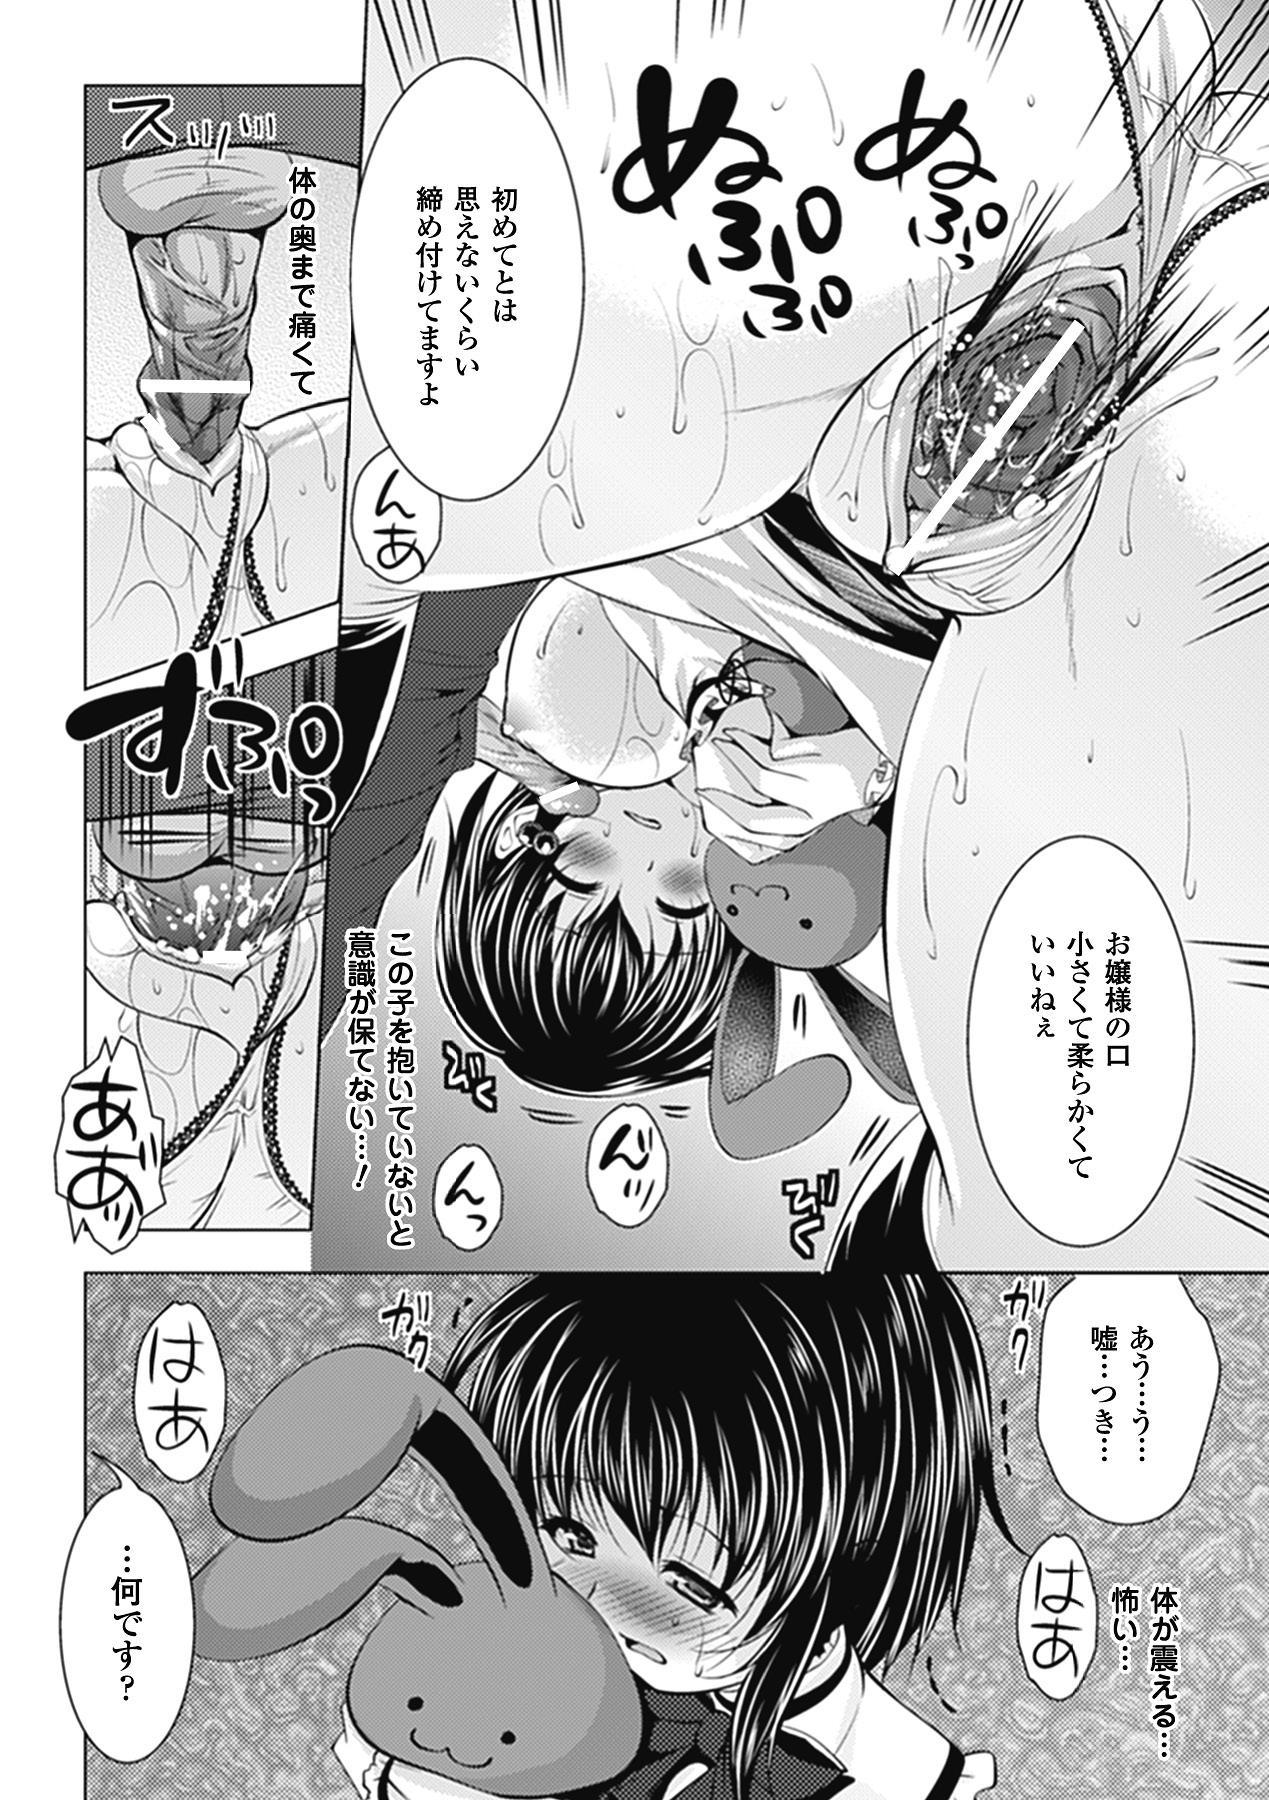 Chikan Anthology Comics Vol. 2 59